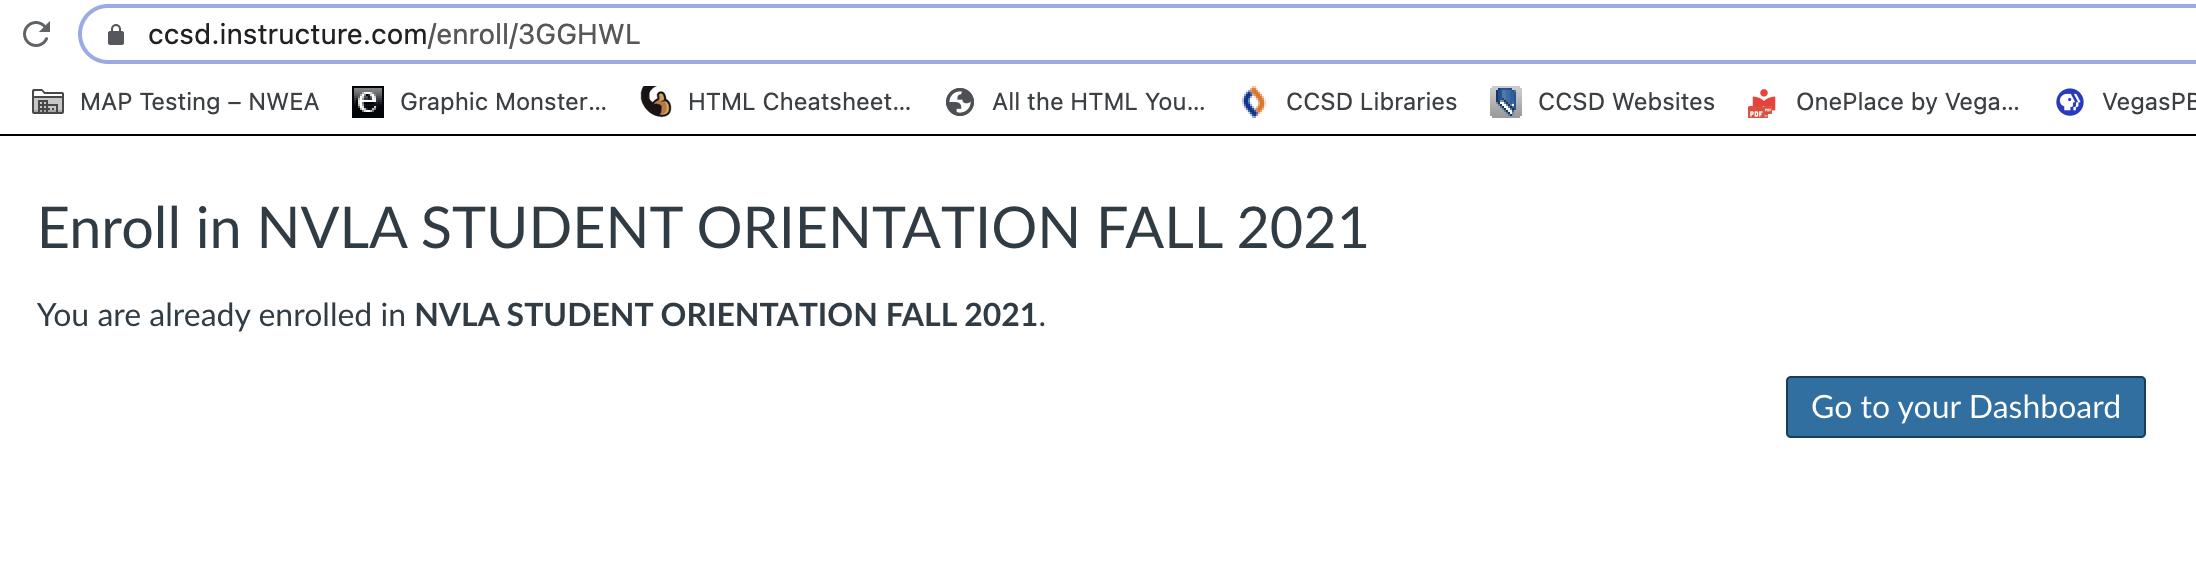 Student Orientation Self Enroll